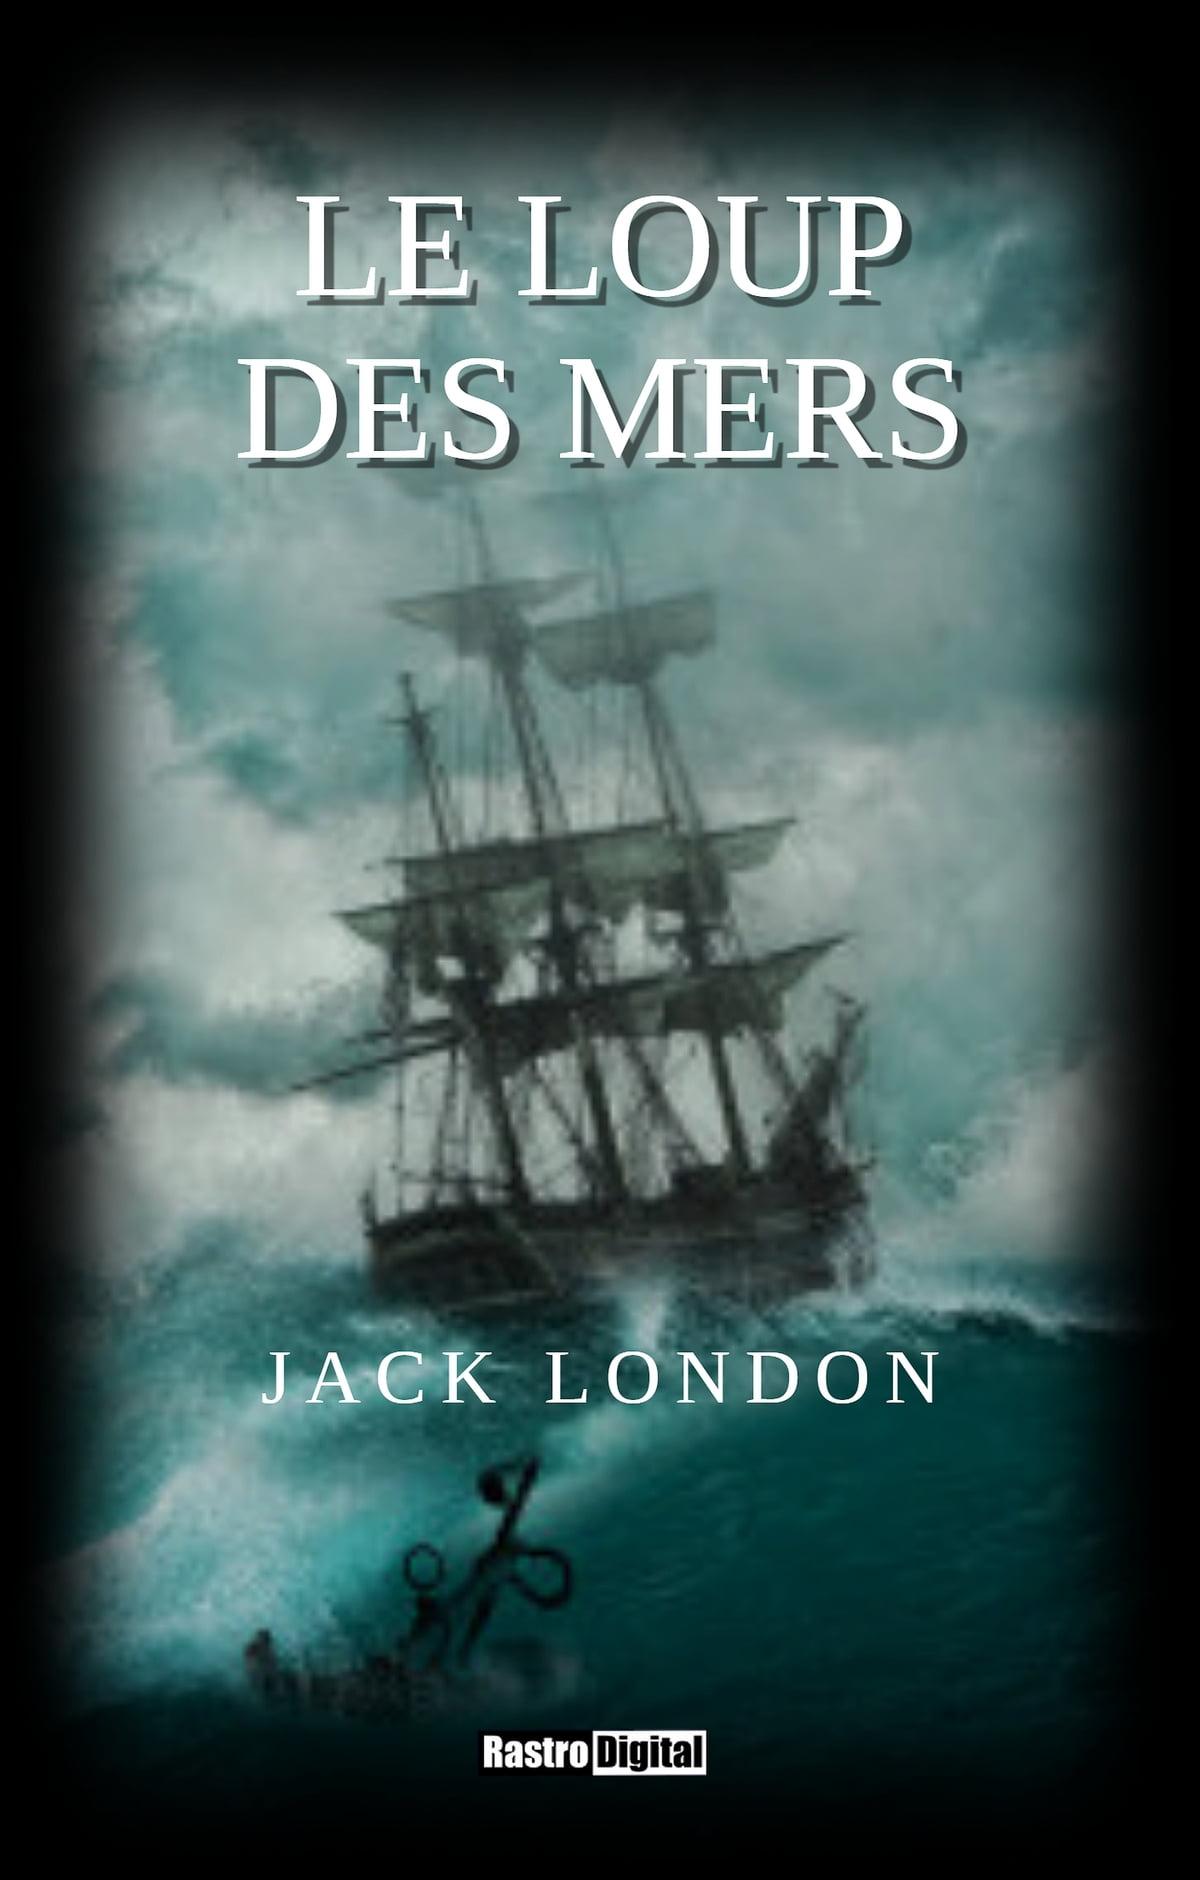 Le Loup Des Mers Film : EBook, London, 1230003650110, Rakuten, Canada